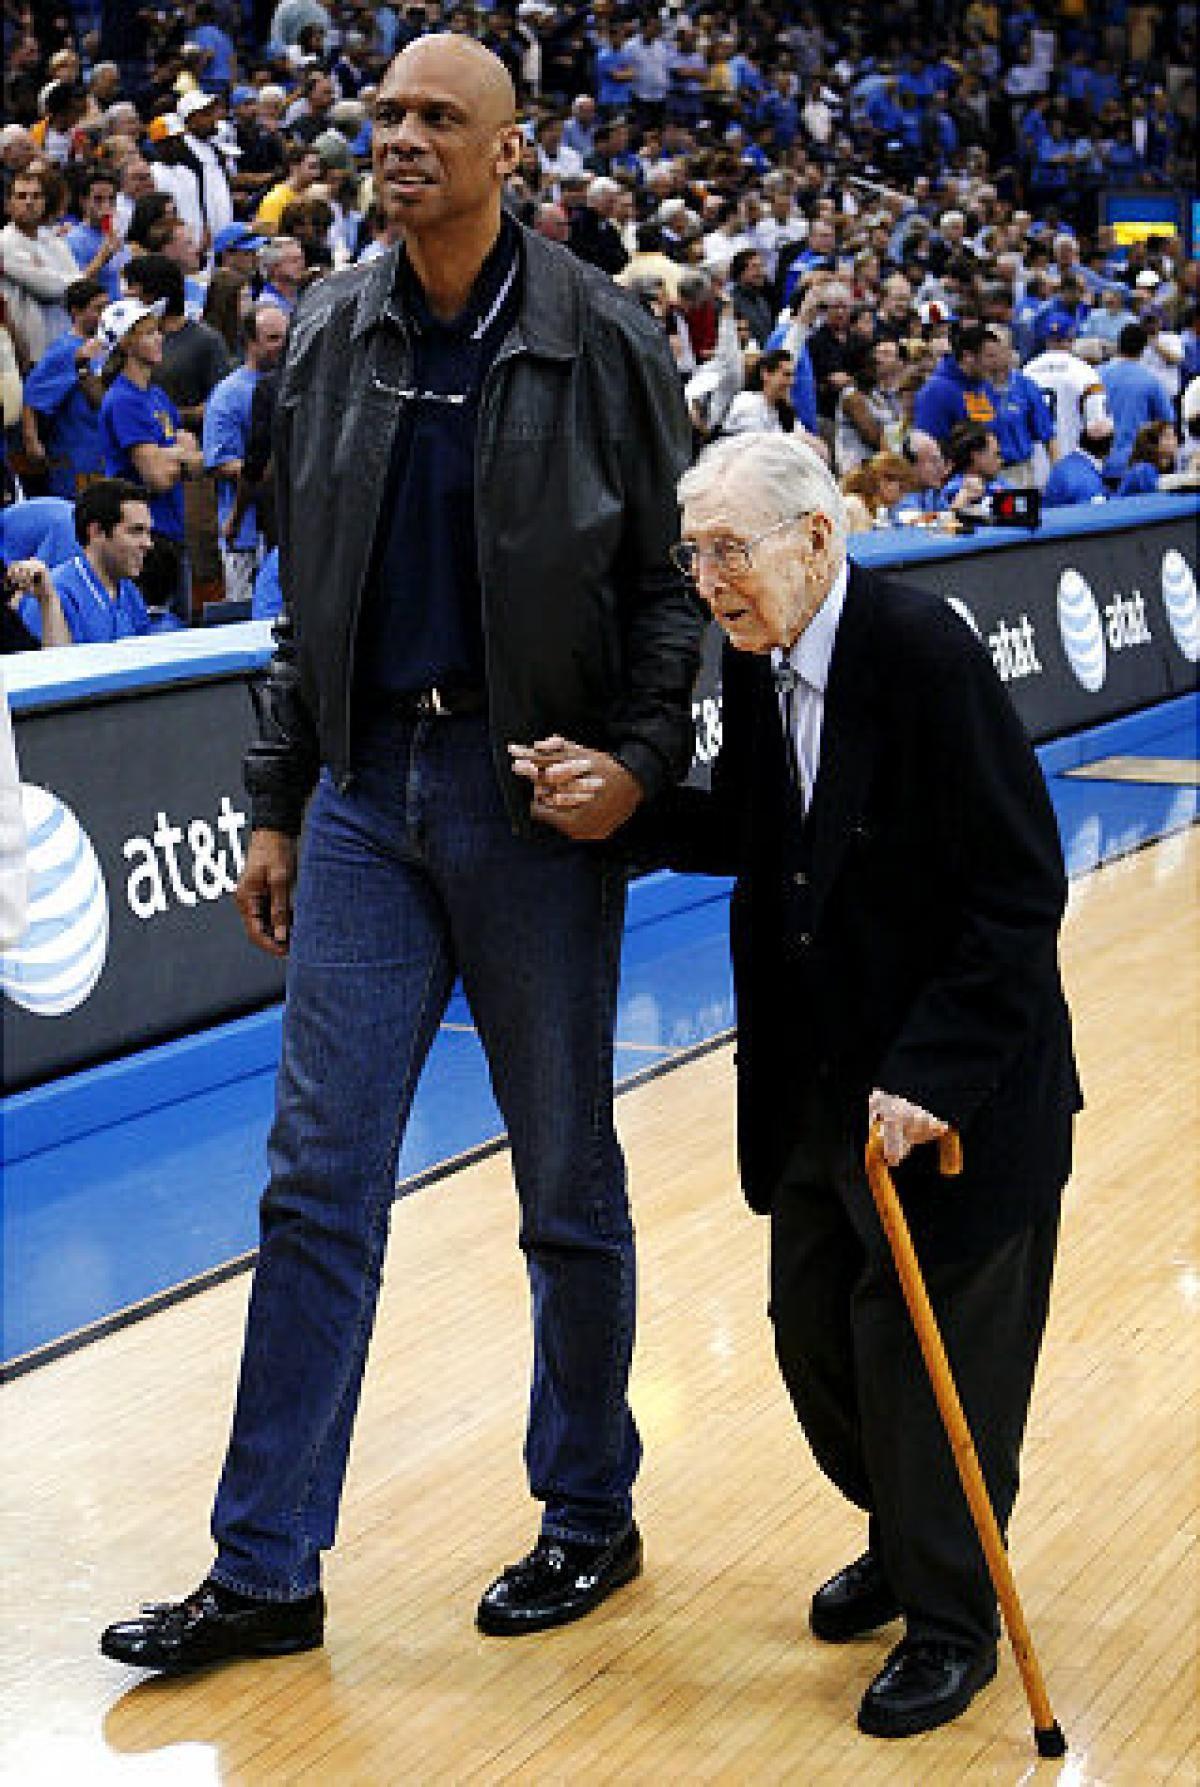 097dd98bc4a Legendary UCLA basketball coach John Wooden dies at 99 - slide 3 ...